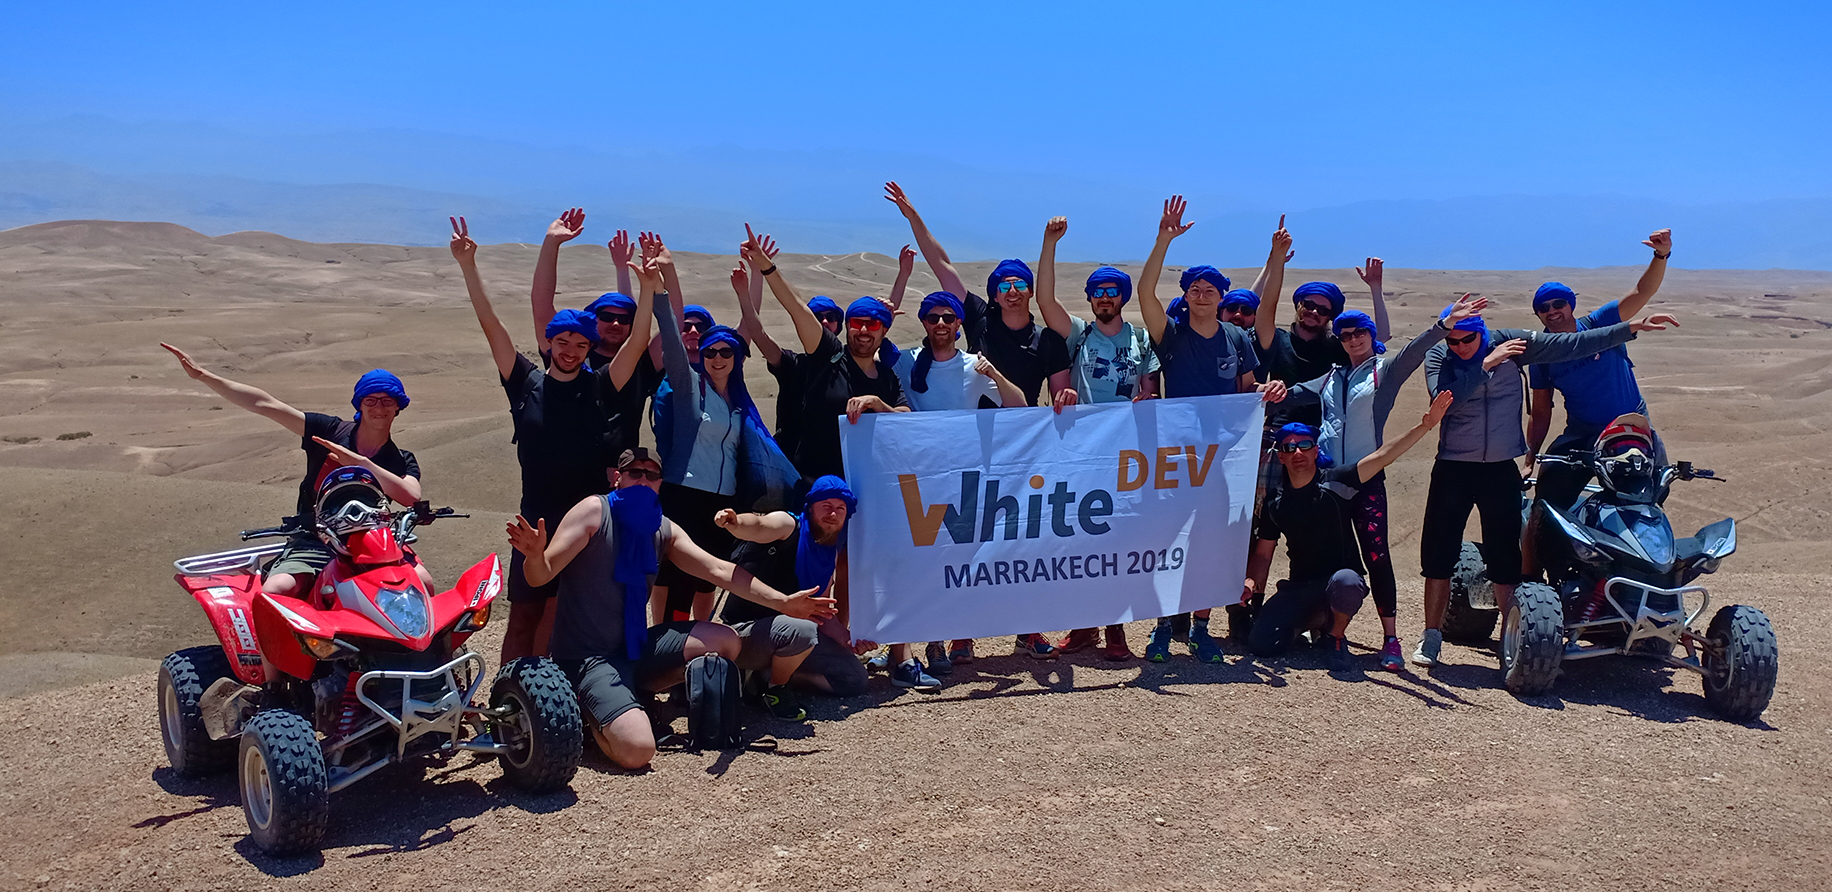 Voyage des 10 ans de WhiteDev au Maroc